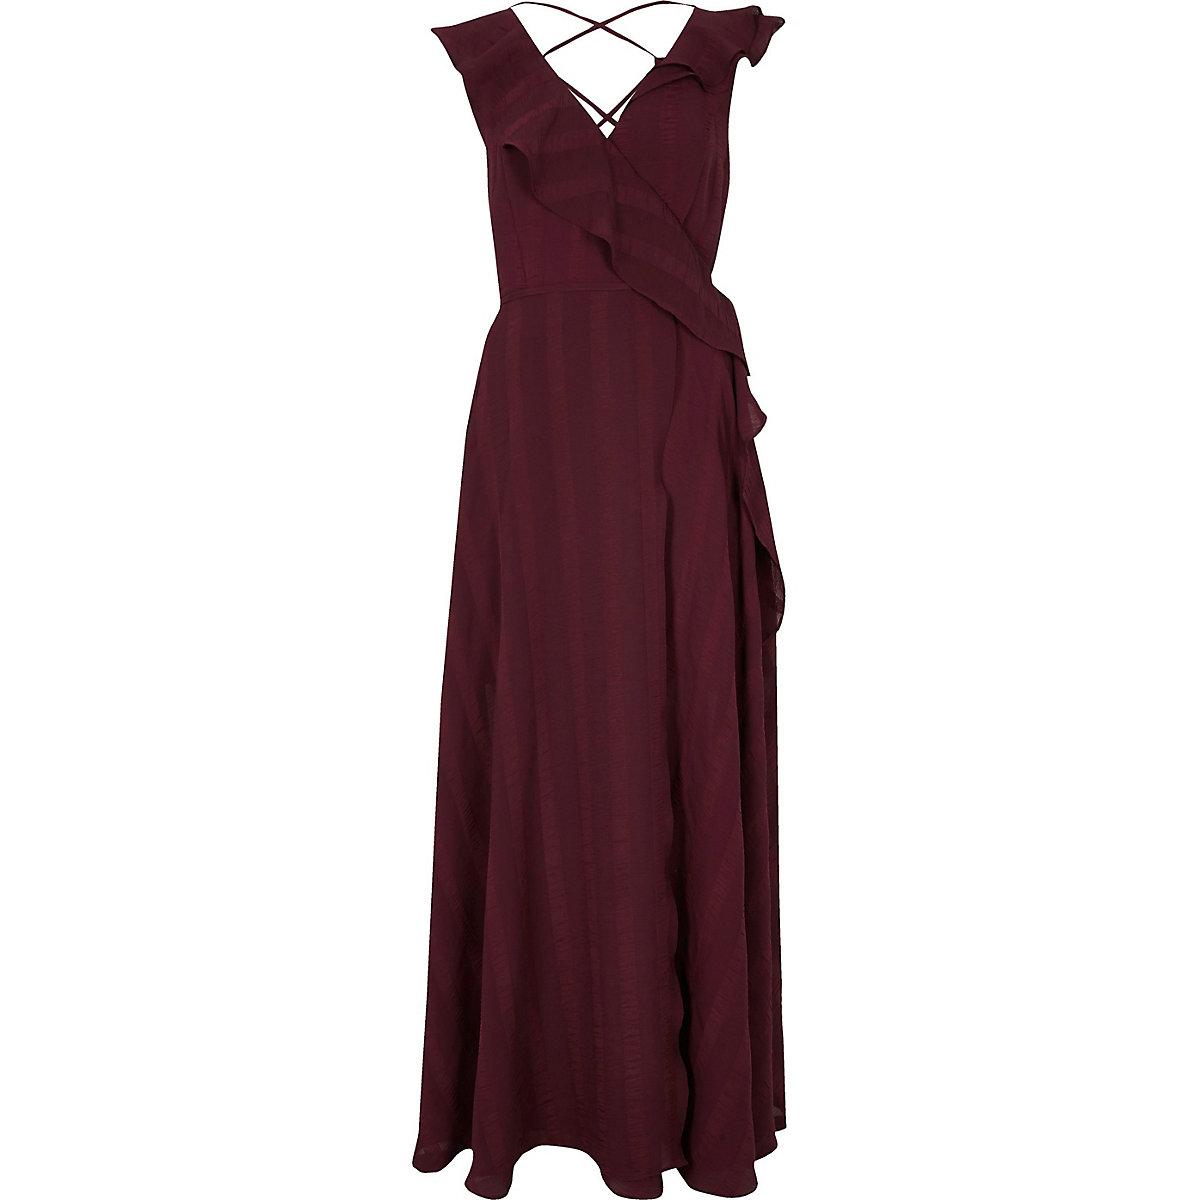 Burgundy stripe frill wrap maxi dress